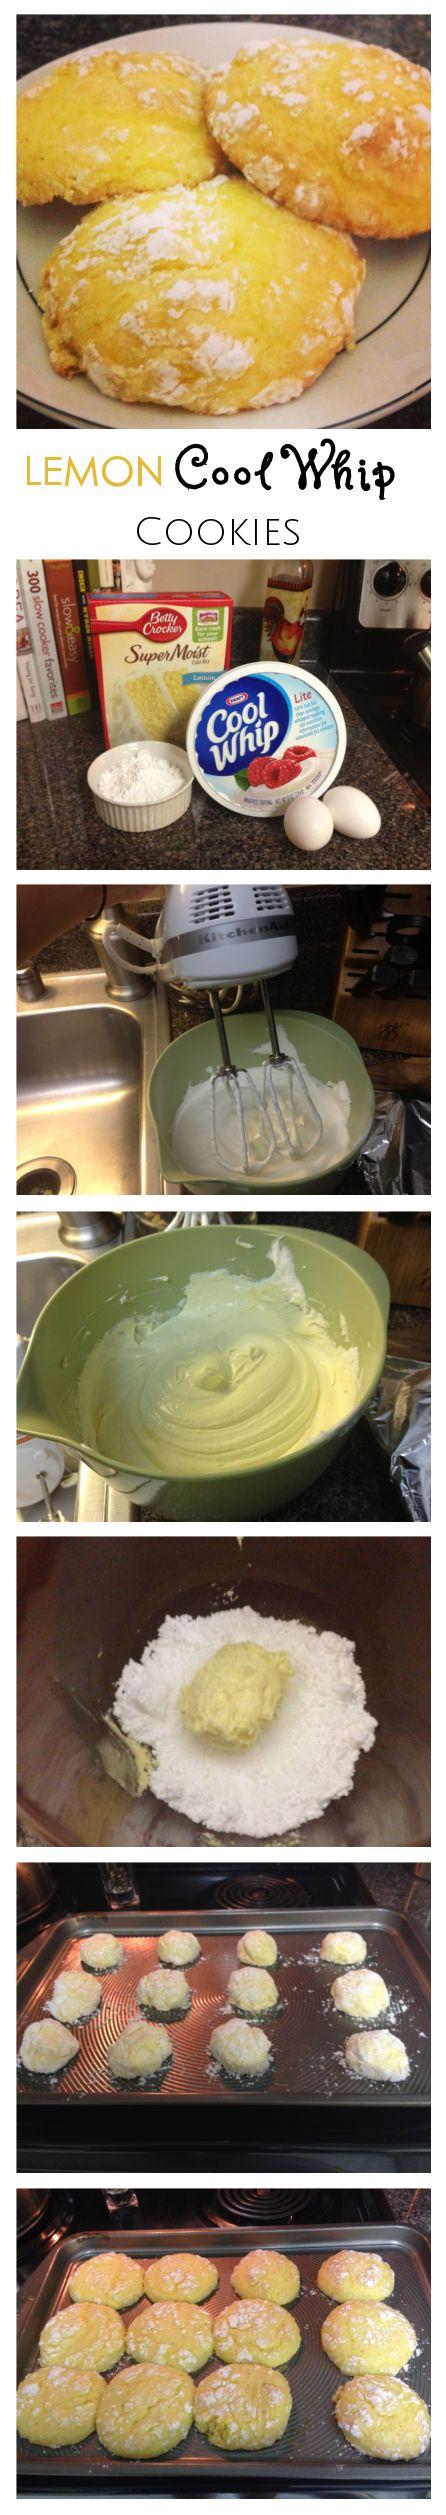 Lemon Cool Whip Cookies | www.makemesomethingsweet.com #CoolWhip # ...